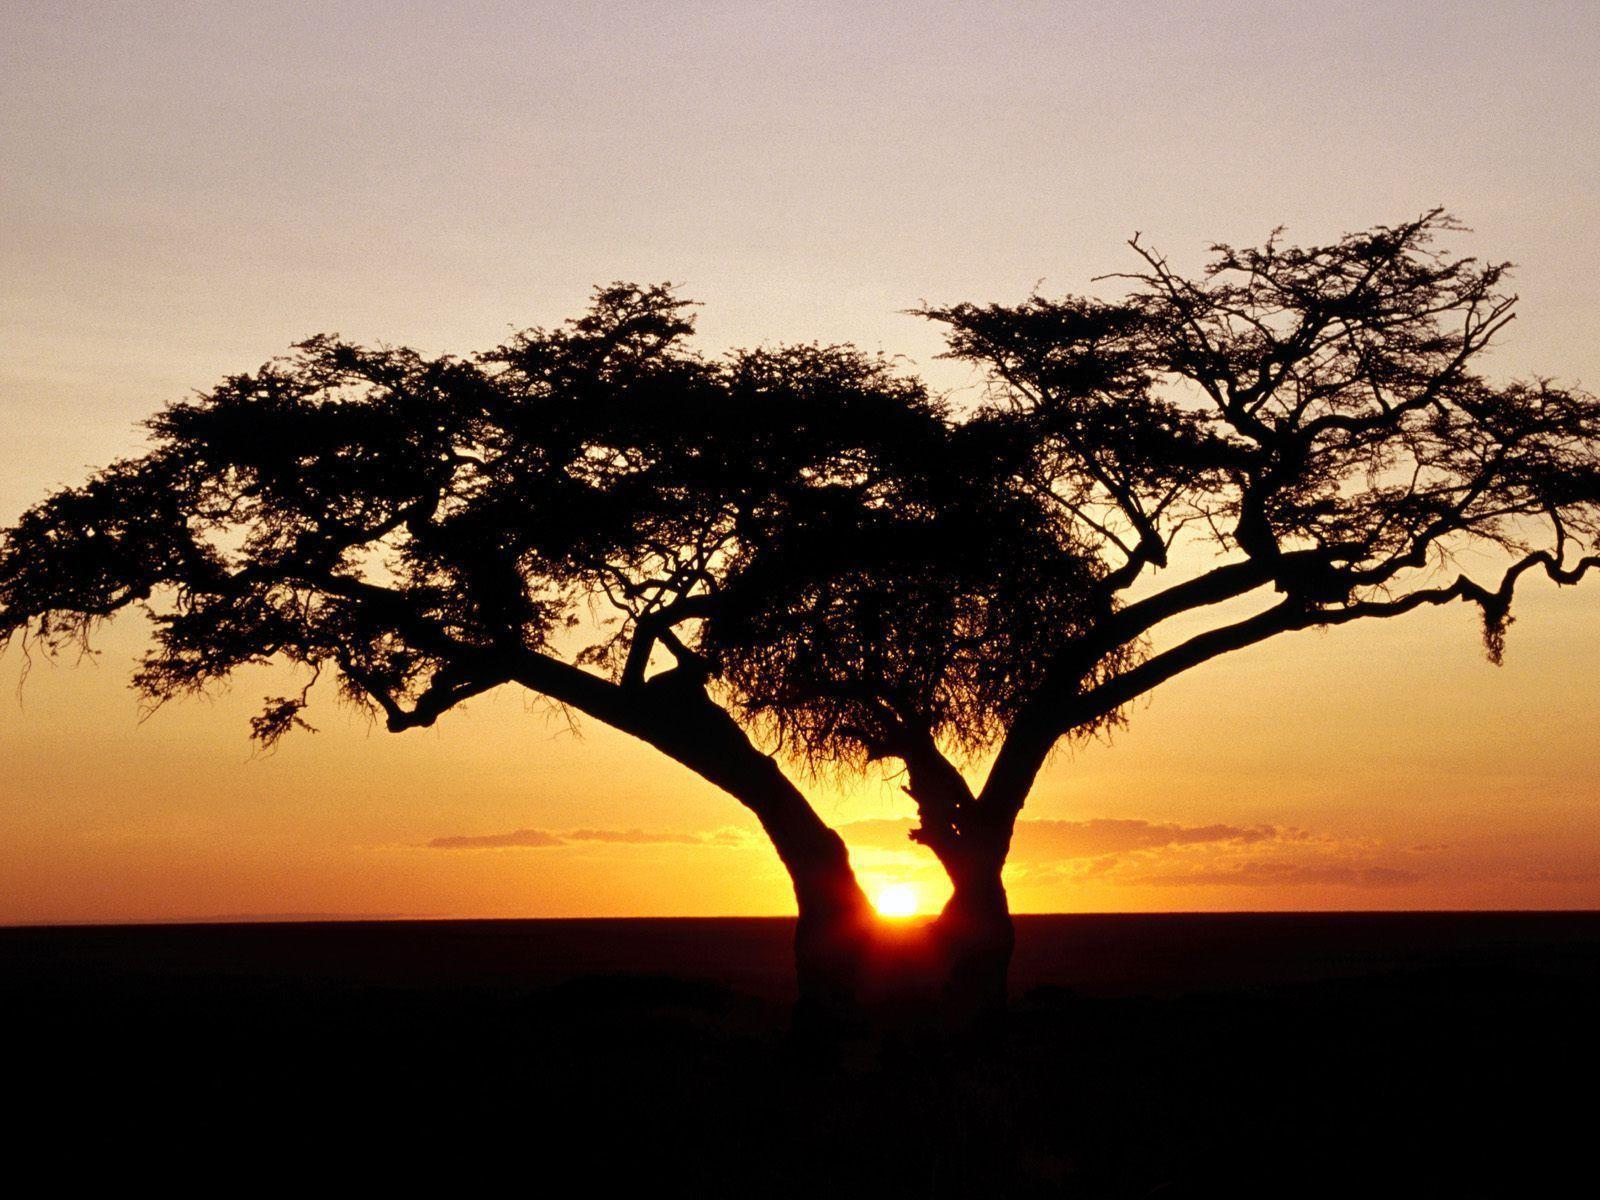 HD Wallpapers: 1600x1200 » Nature » Safari Sunrise, Africa Free ...